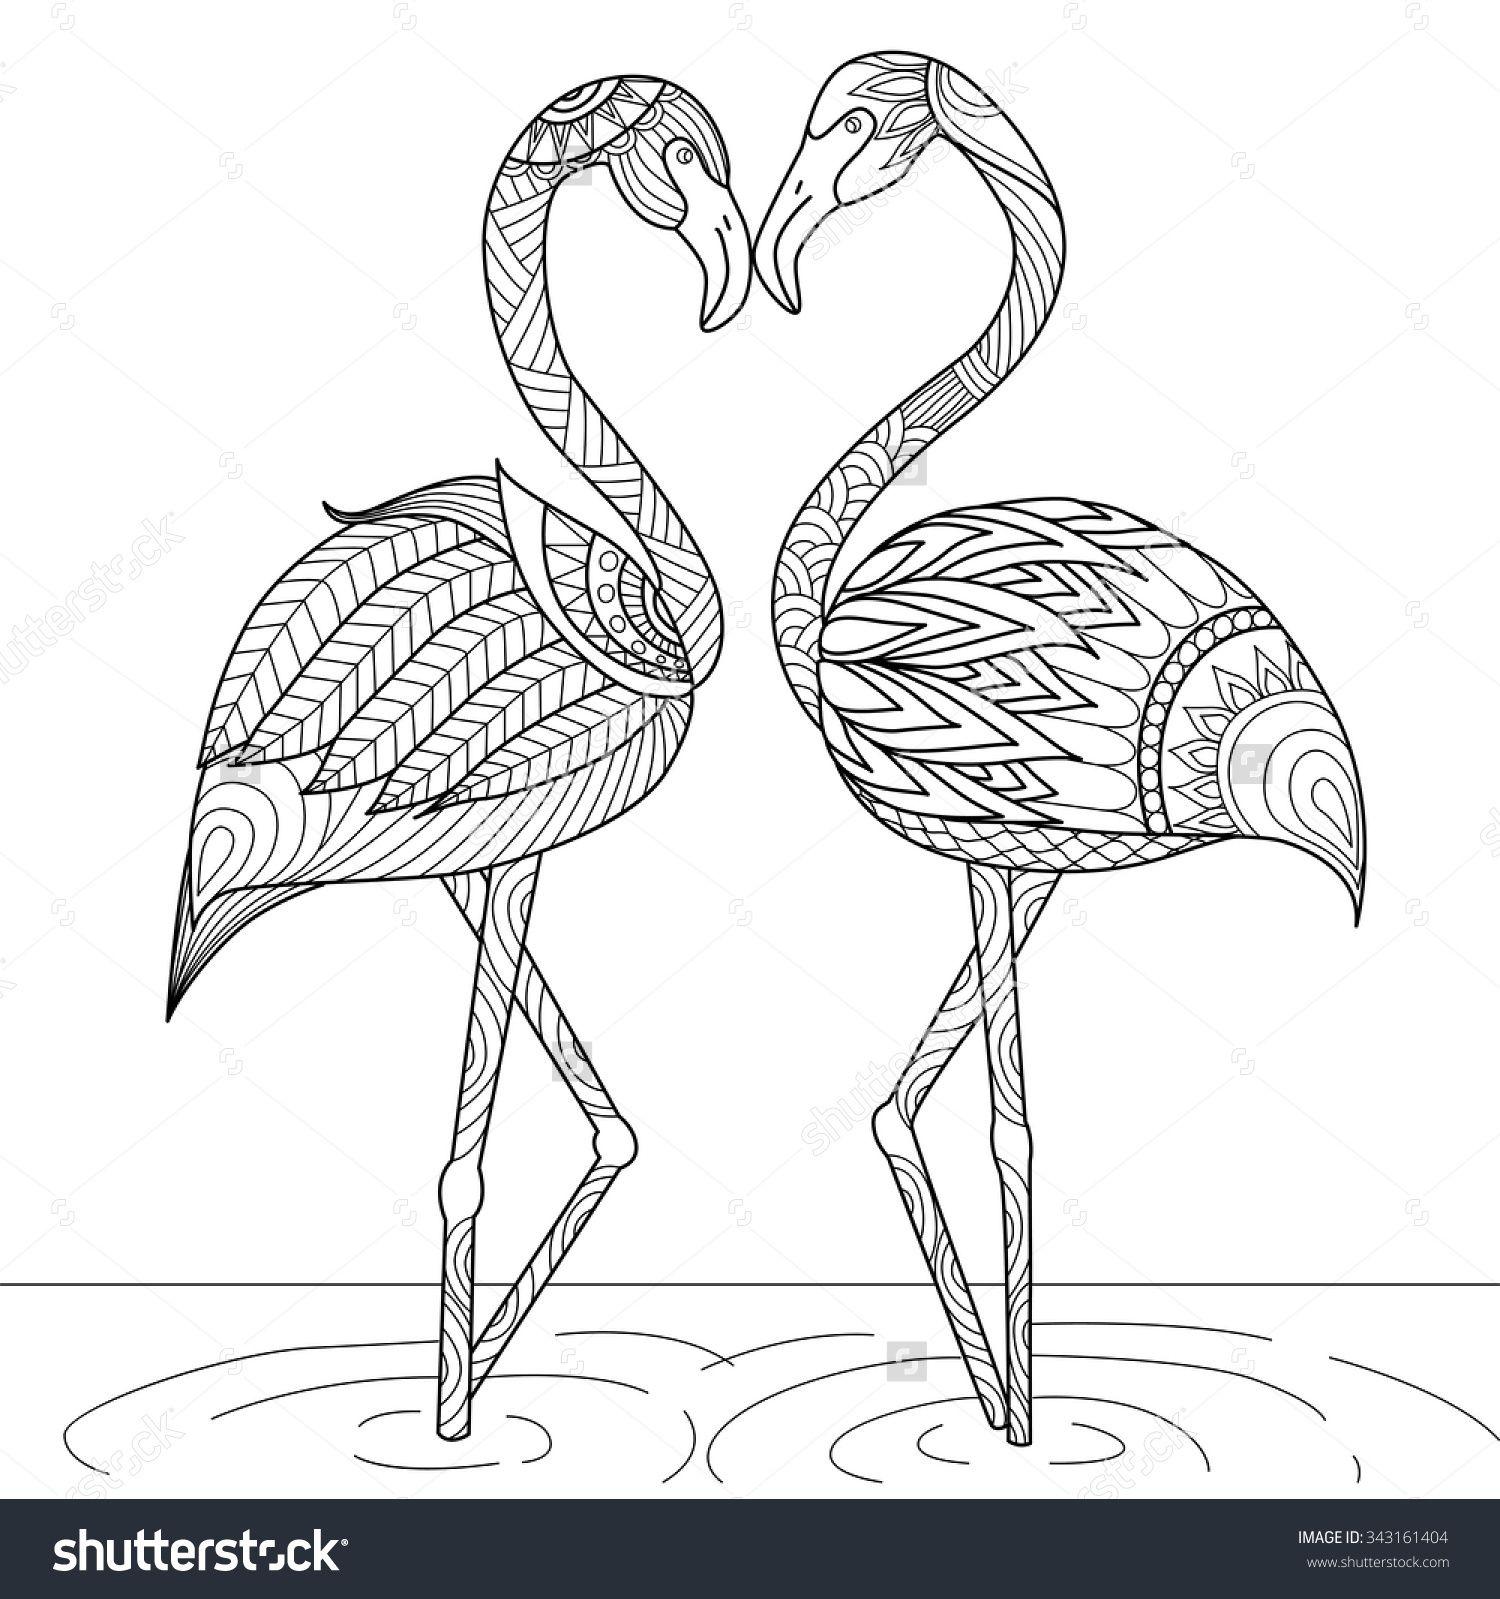 Hand Drawn Flamingo Couple Zentangle Style For Coloring Bookinvitation Cardlogoshirt Or Bag Design